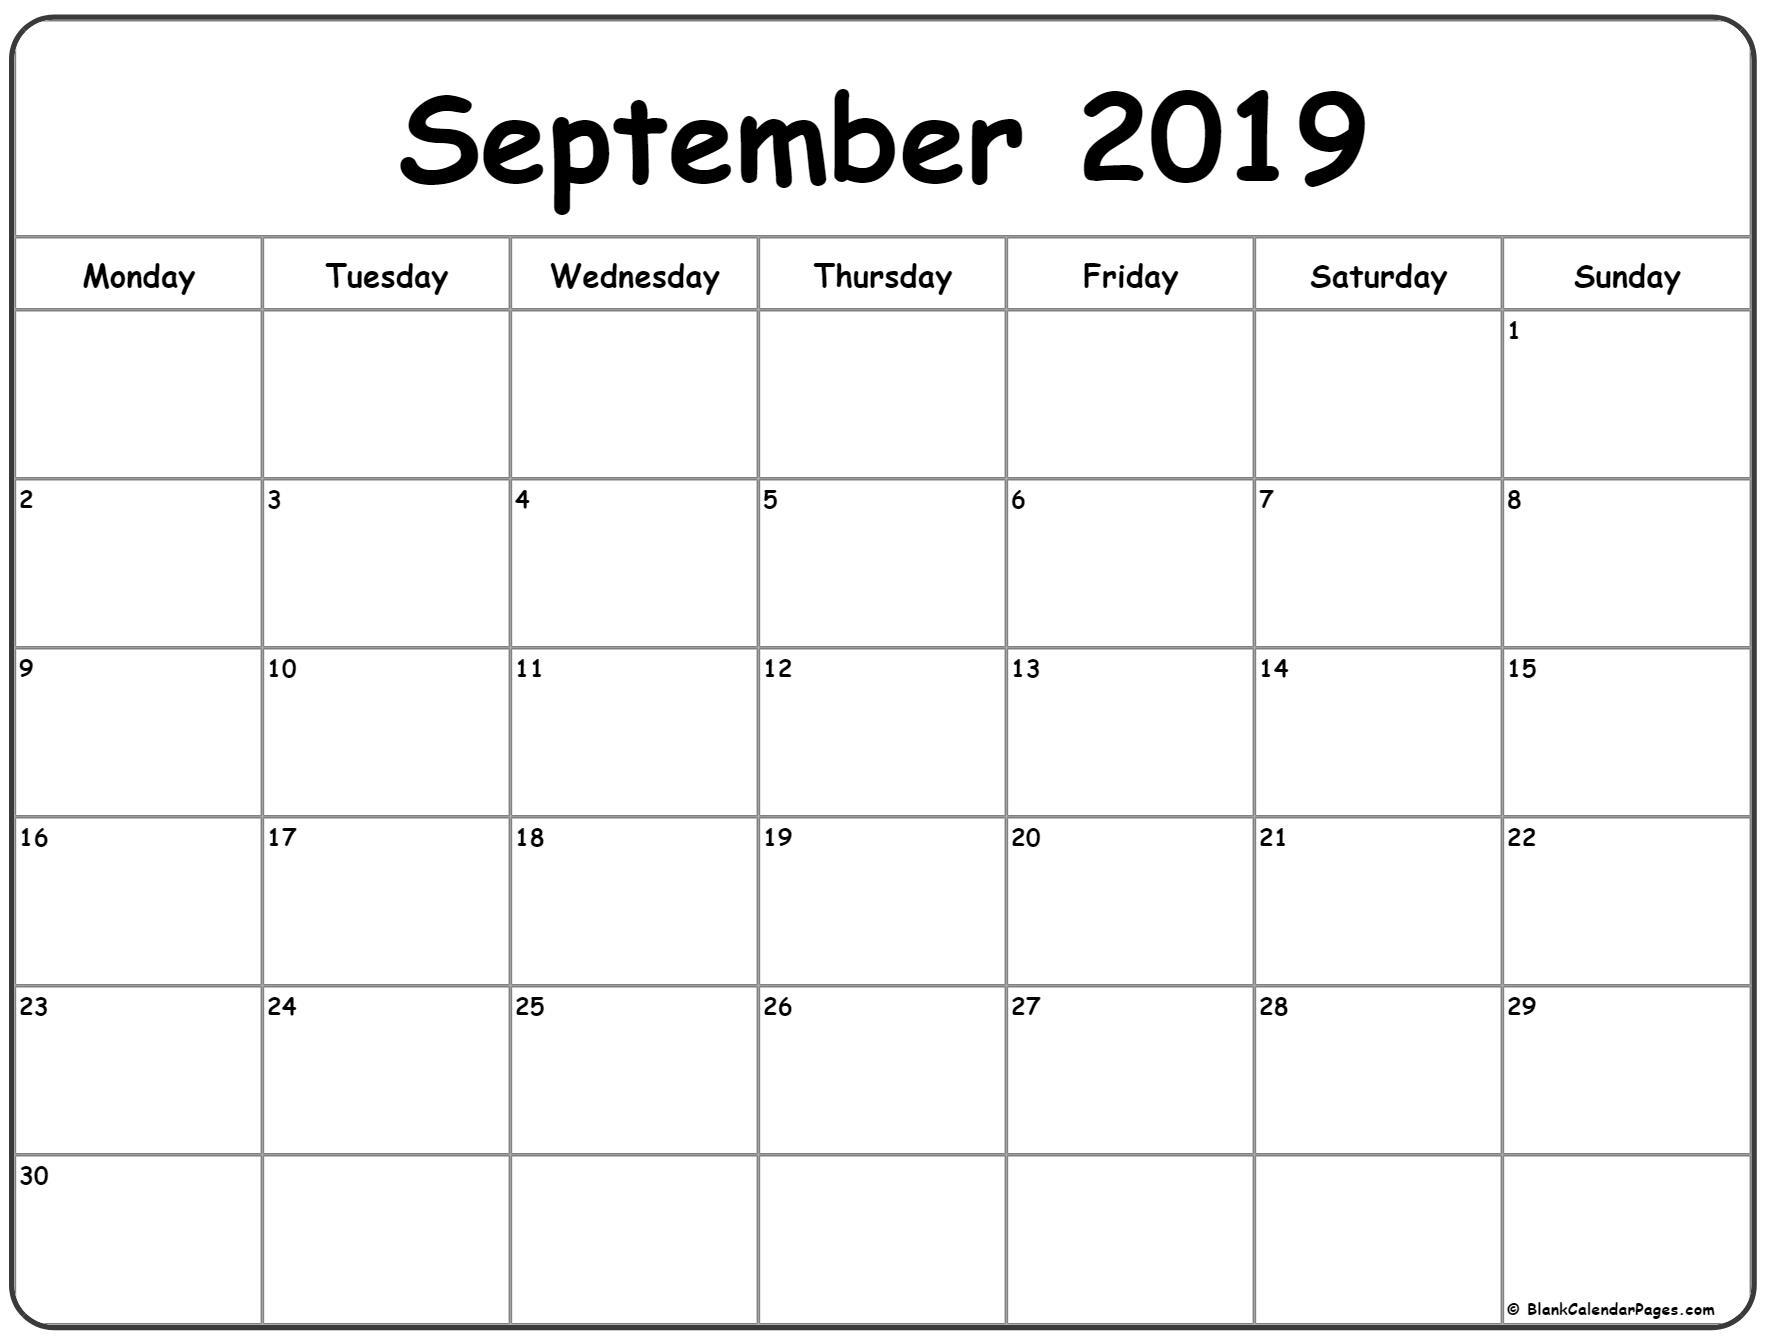 September 2019 Monday Calendar | Monday To Sunday